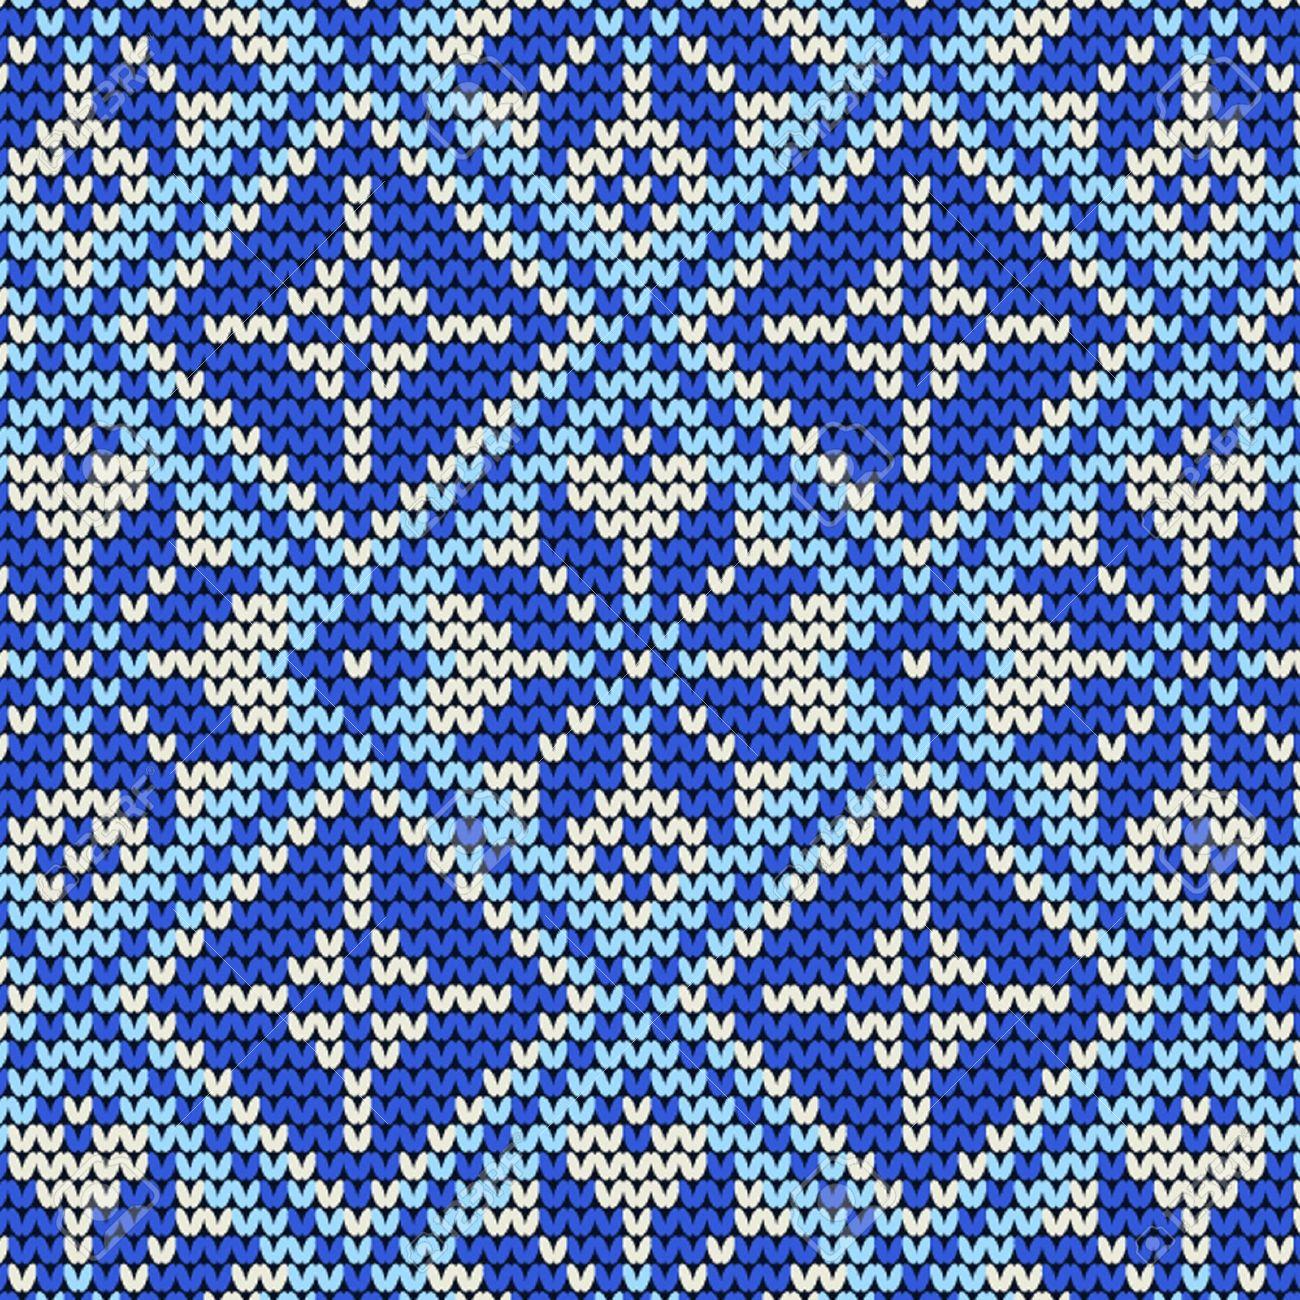 Seamless Knit Pattern, Knitted Texture Seamless Snowflake Knit ...